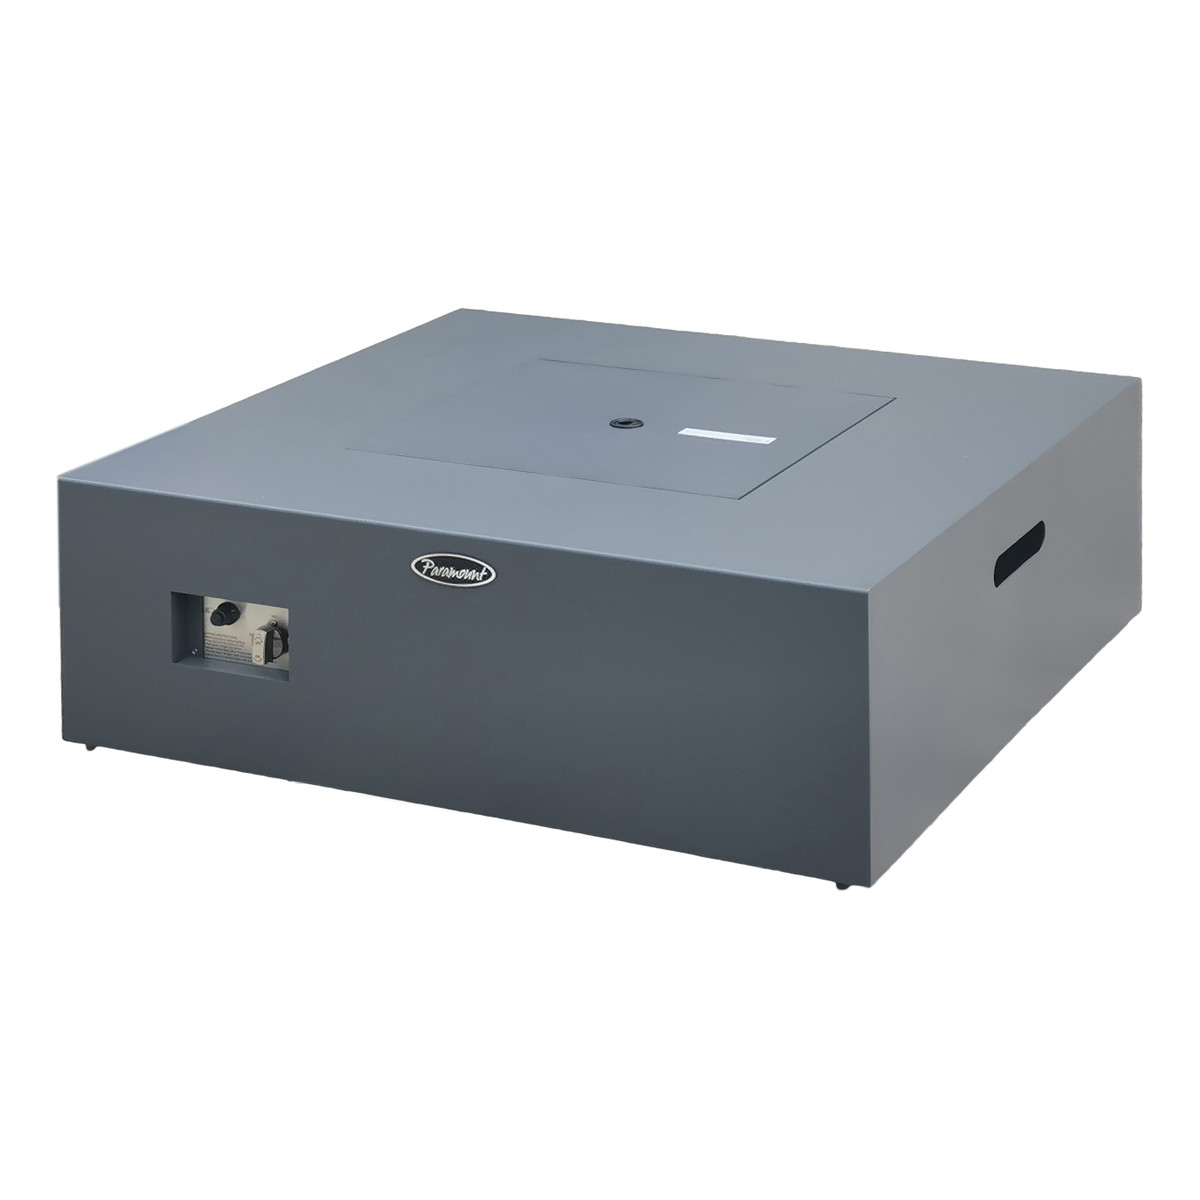 FP-419.media-a-paramount.concrete.look.firetable.aluminum.wb.01